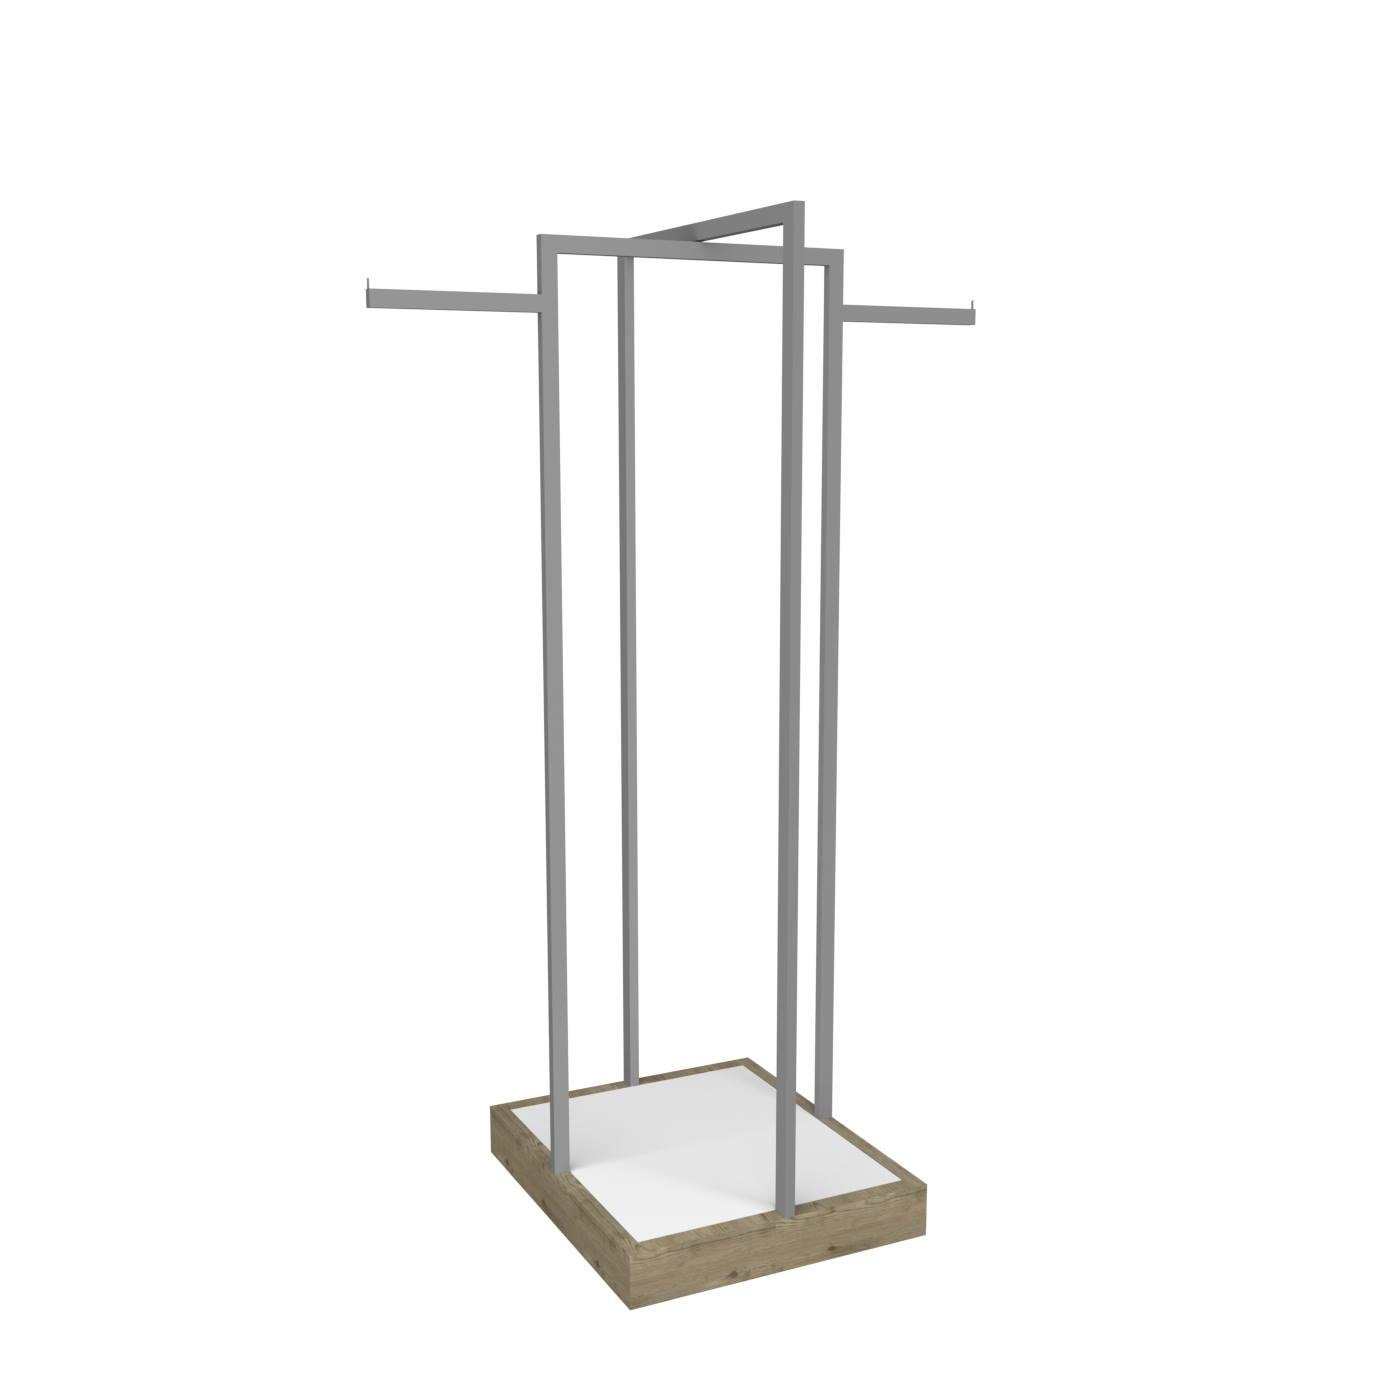 1876ea4d62d Σταντ σταυρός κρέμασης - KM store design - Έπιπλα Σταντ Καταστημάτων